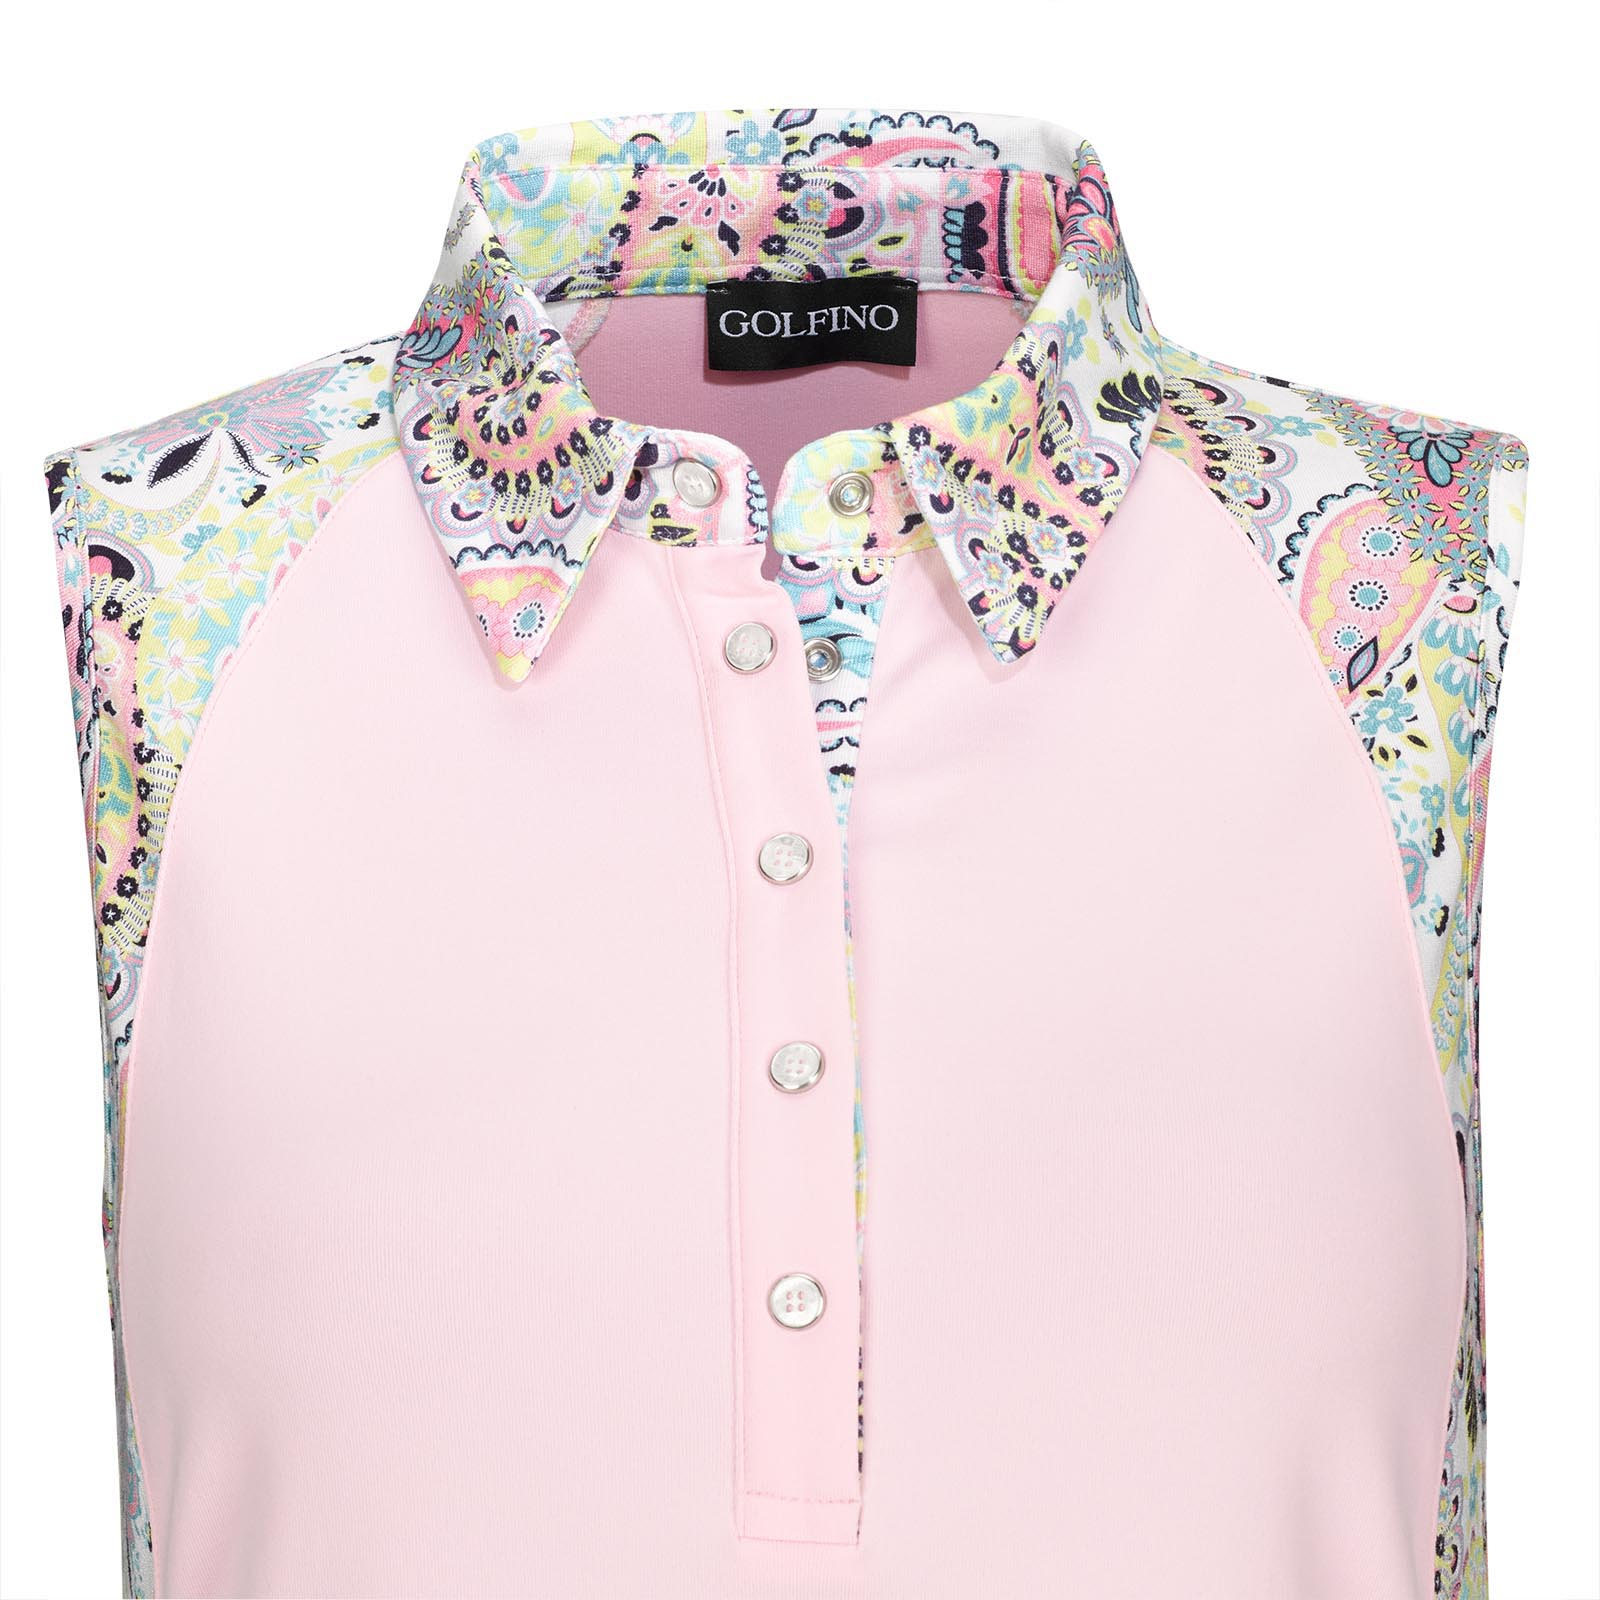 Ärmelloses Stretch Damen-Polohemd aus Lycra® Mix mit Paisley Print